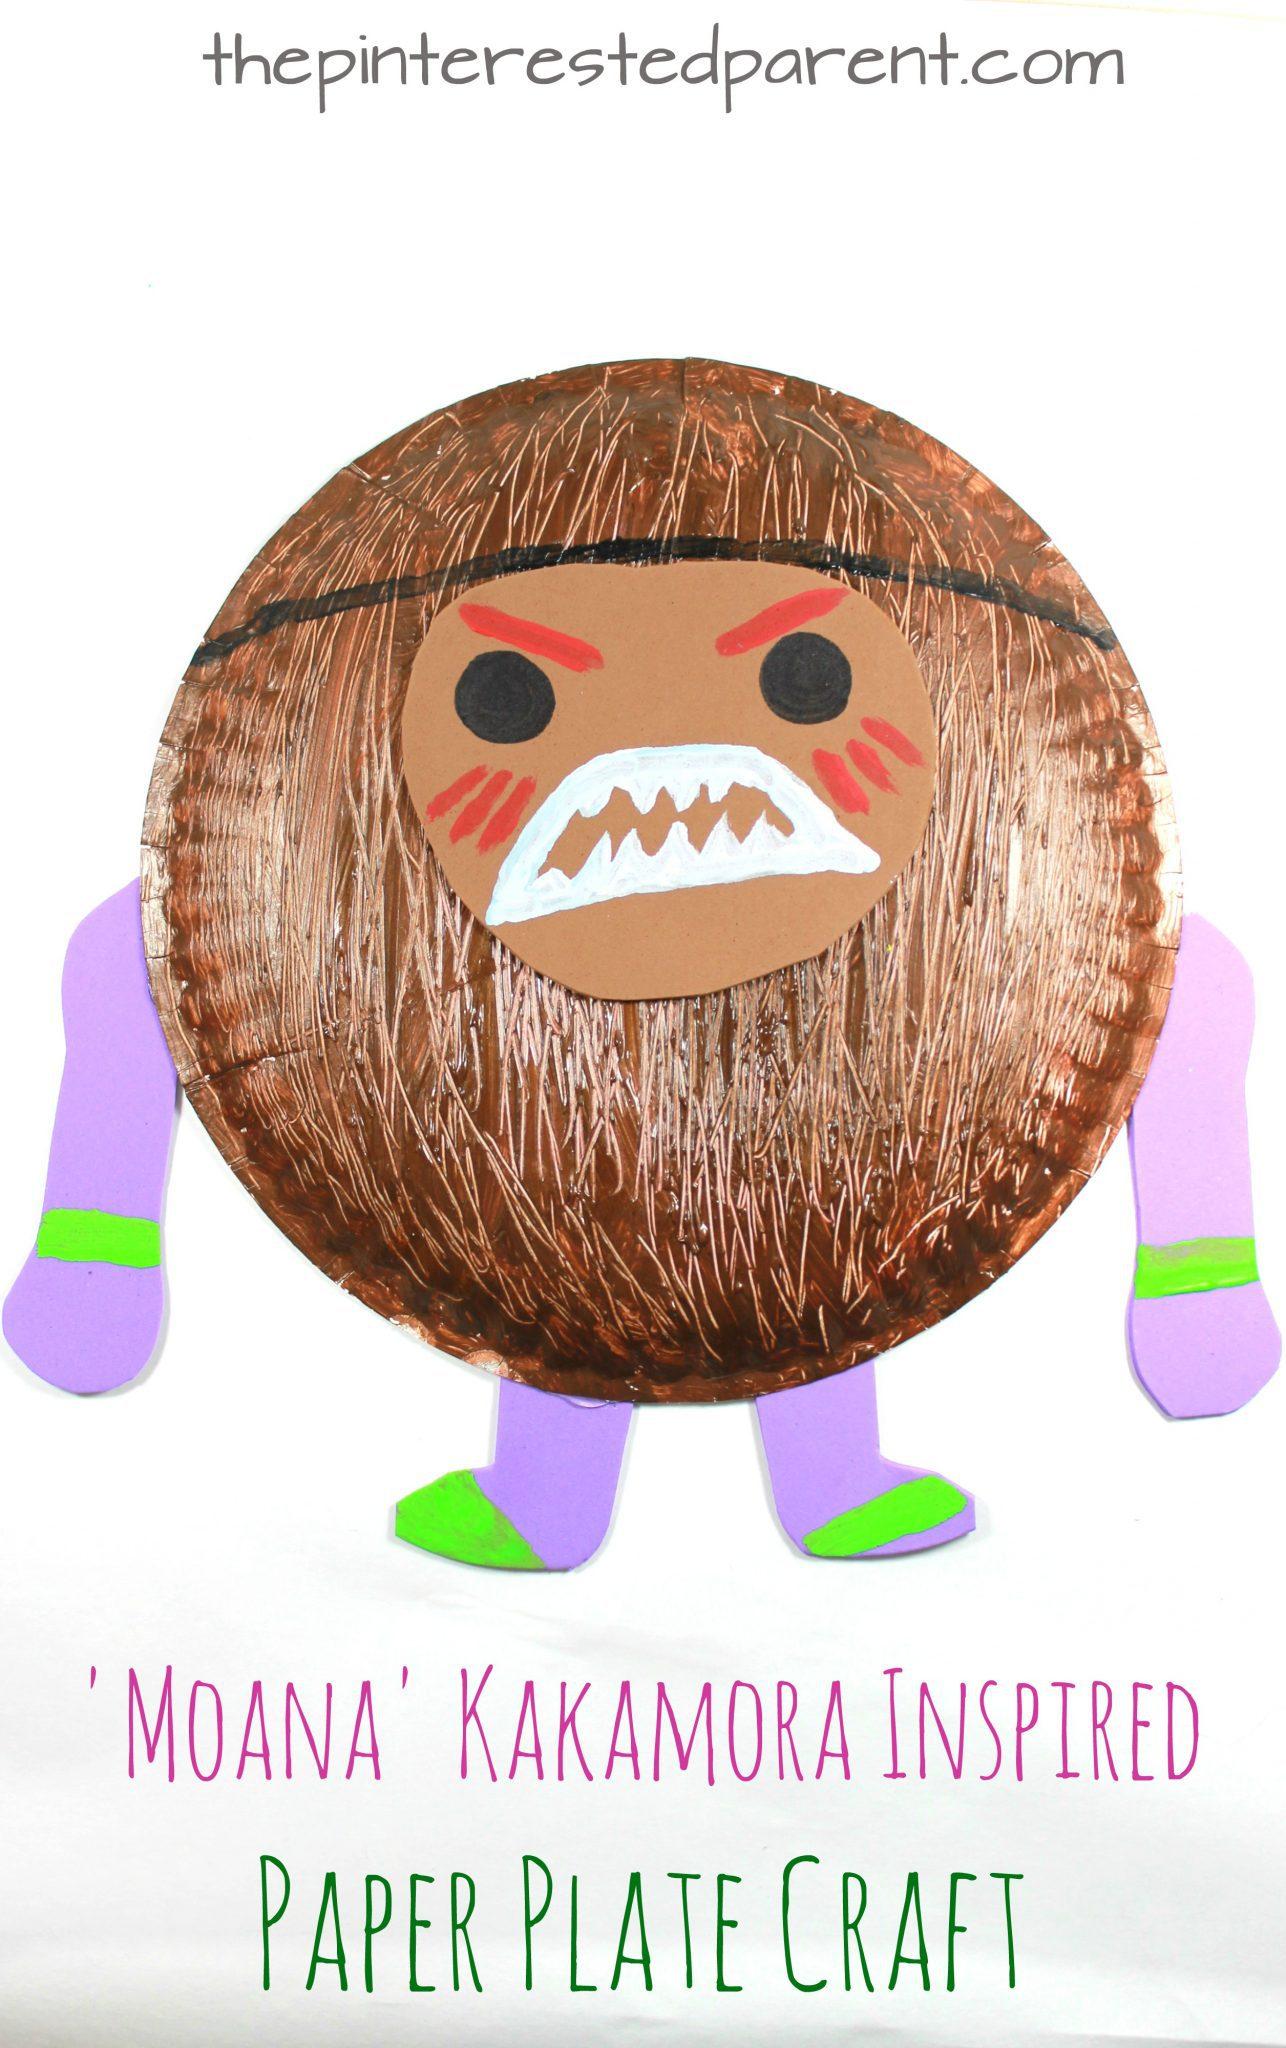 Moana' Kakamora inspired paper plate coconut pirate craft.